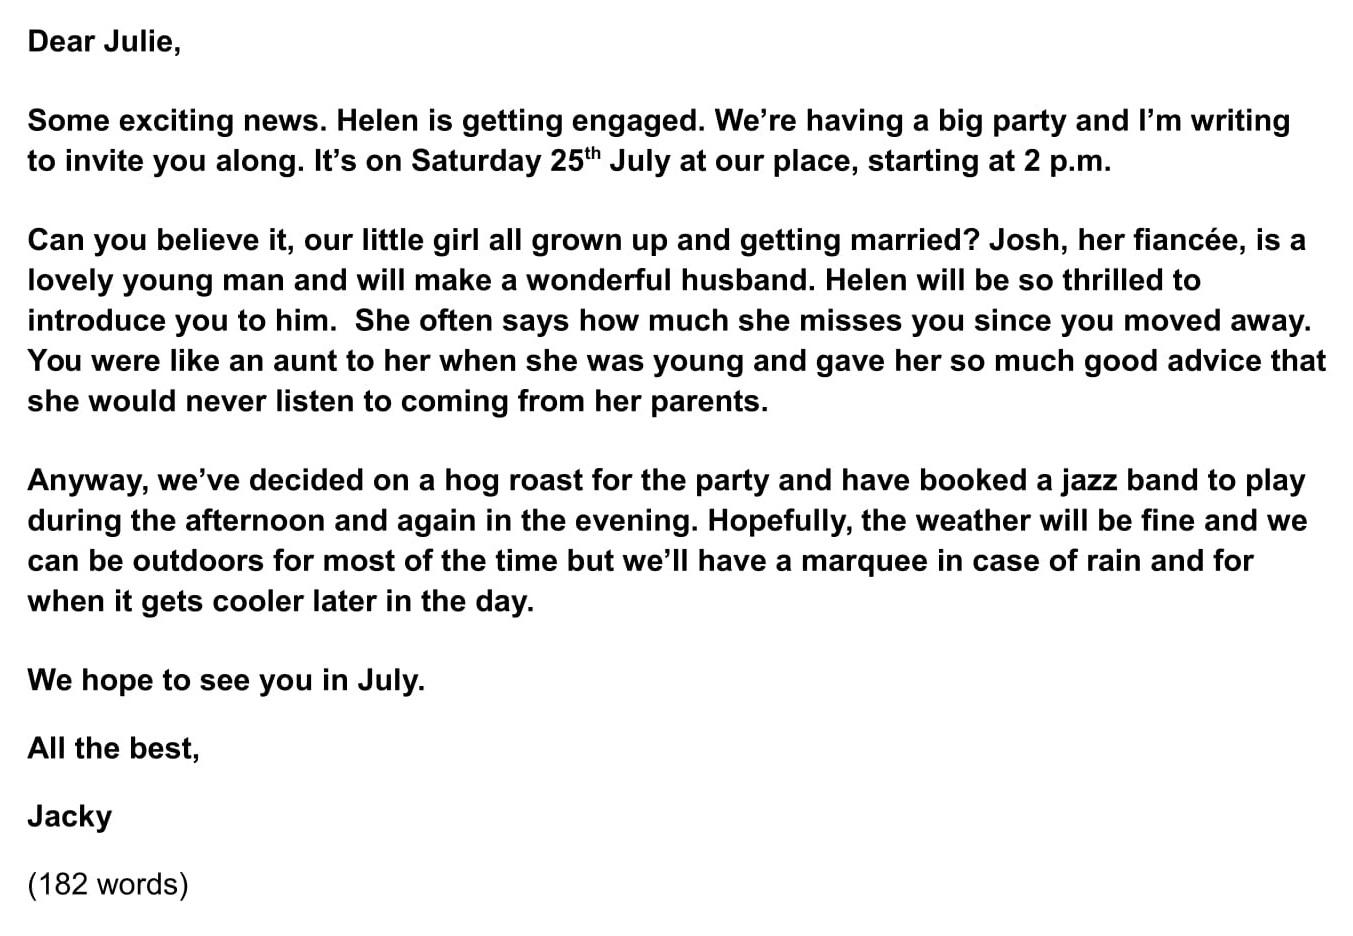 Letter Of Invitation Examples from www.ieltsjacky.com